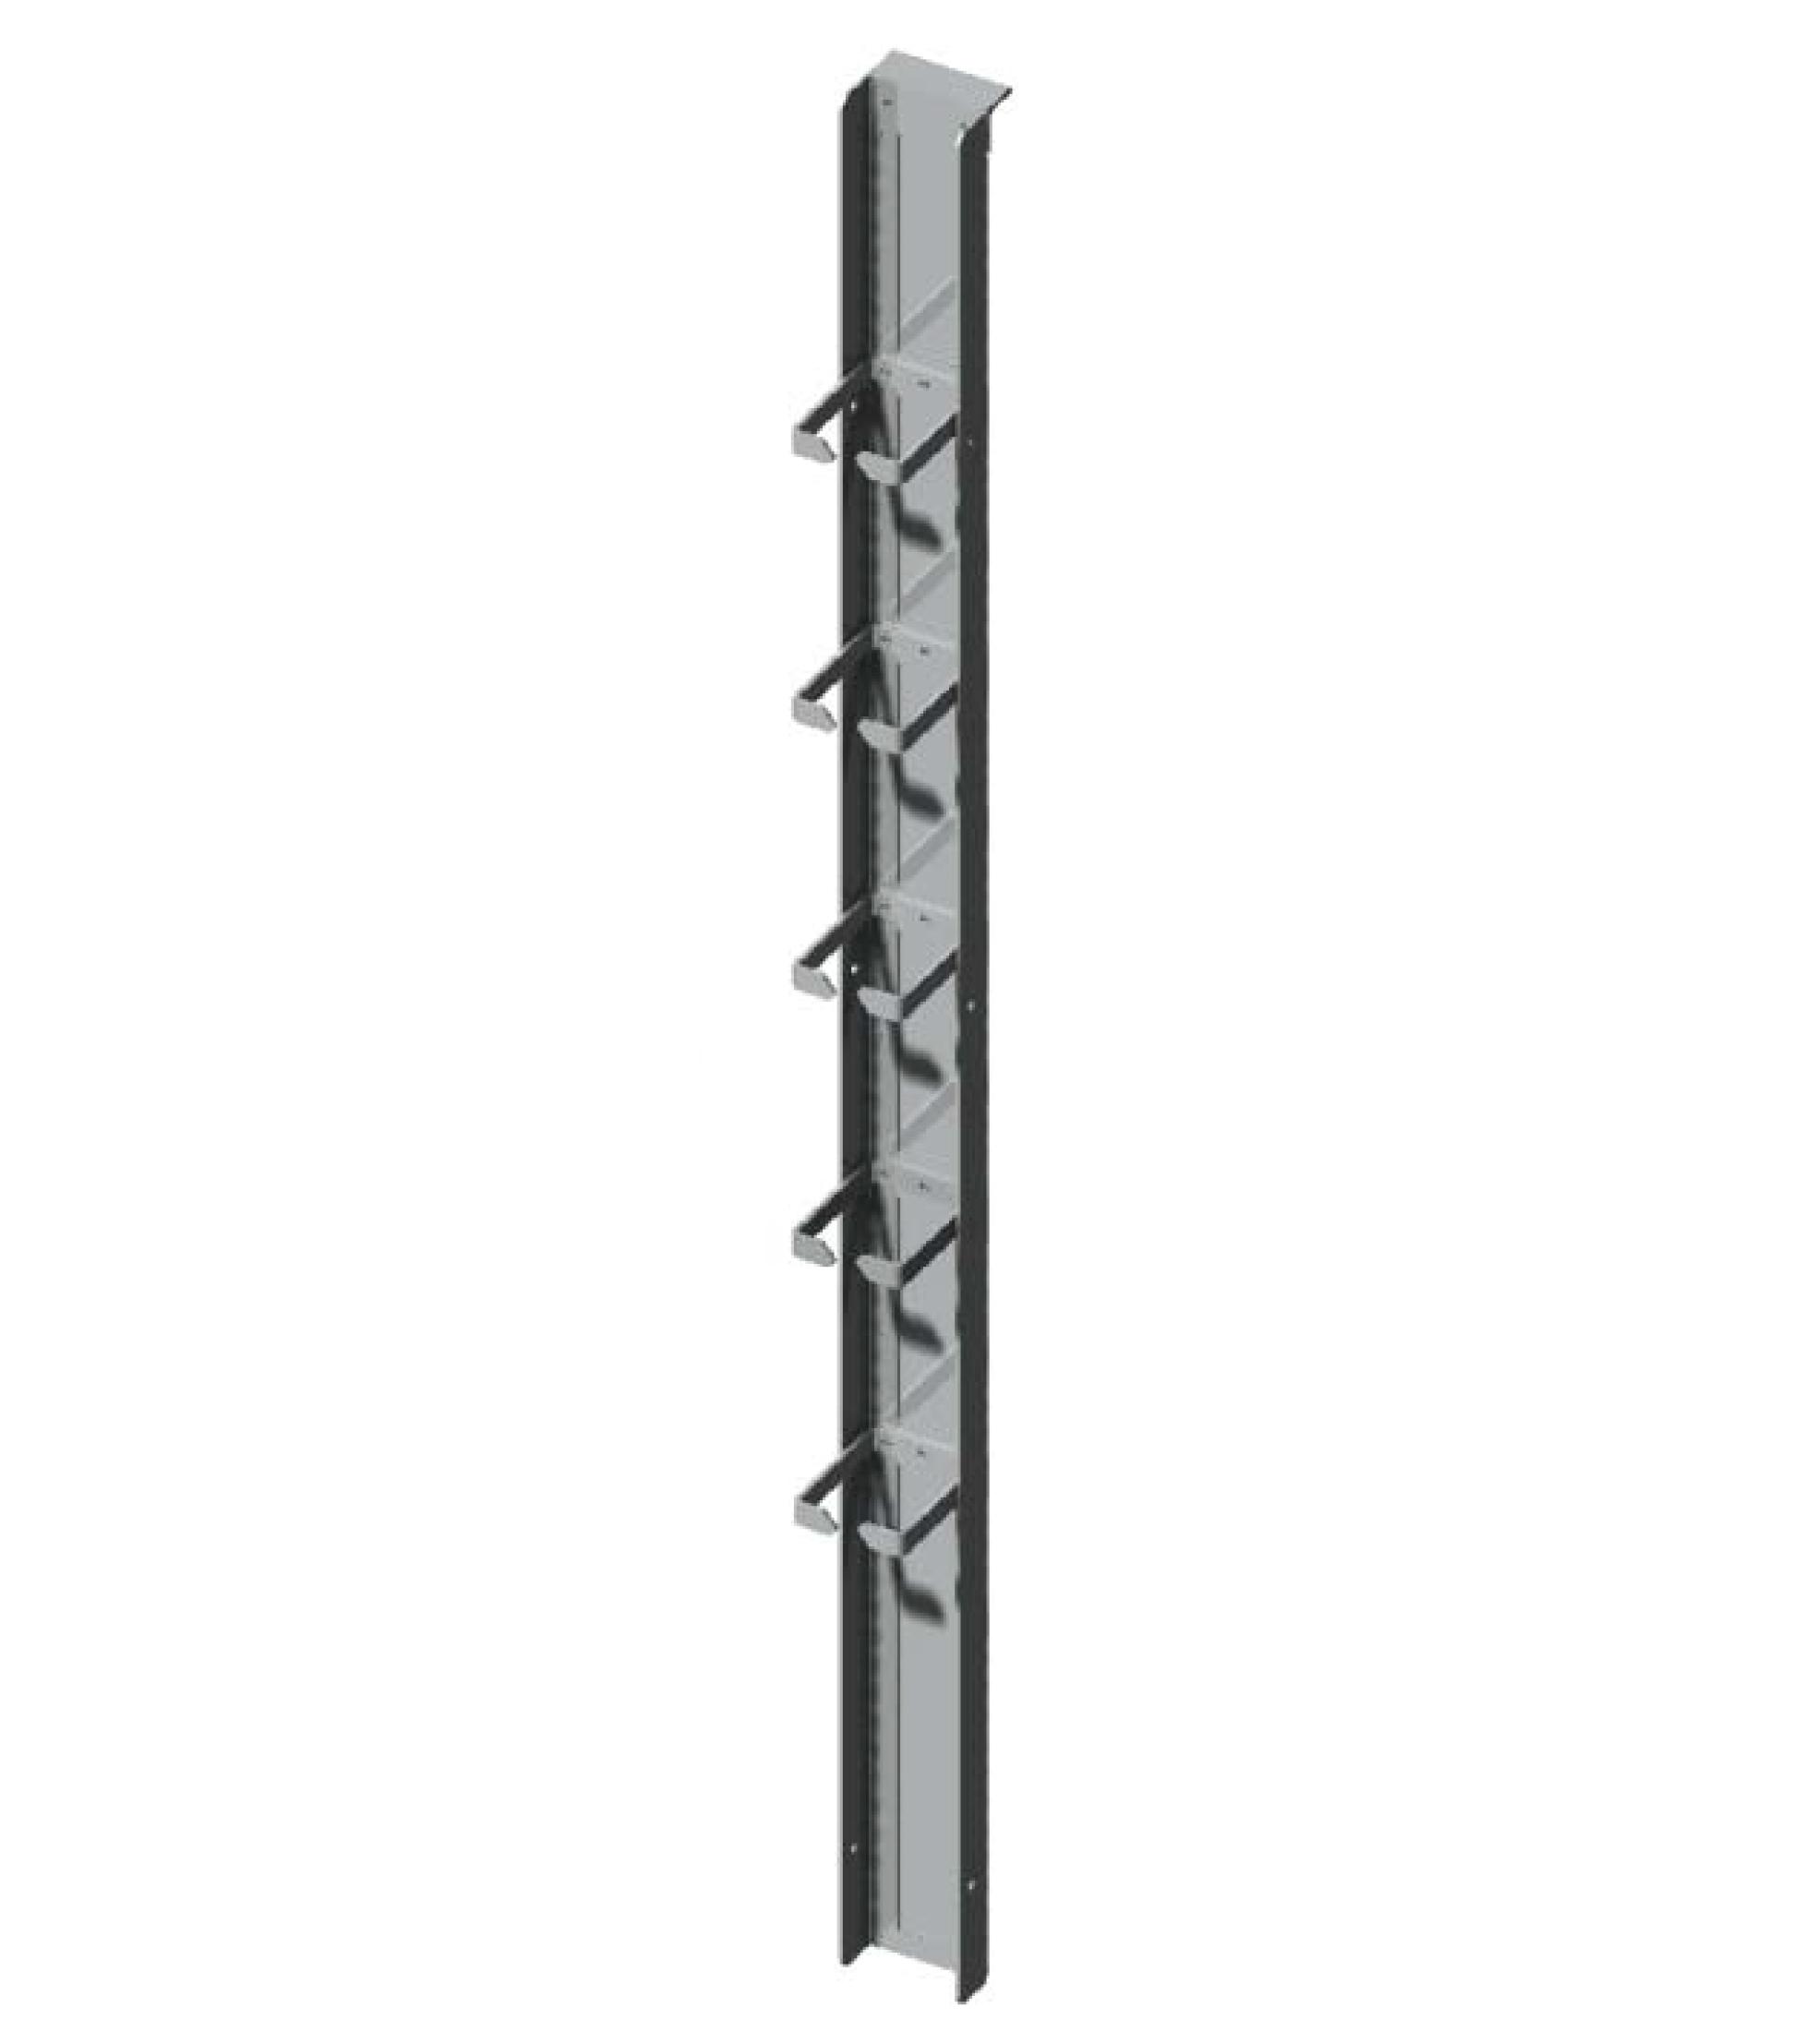 Section C - Cable Management